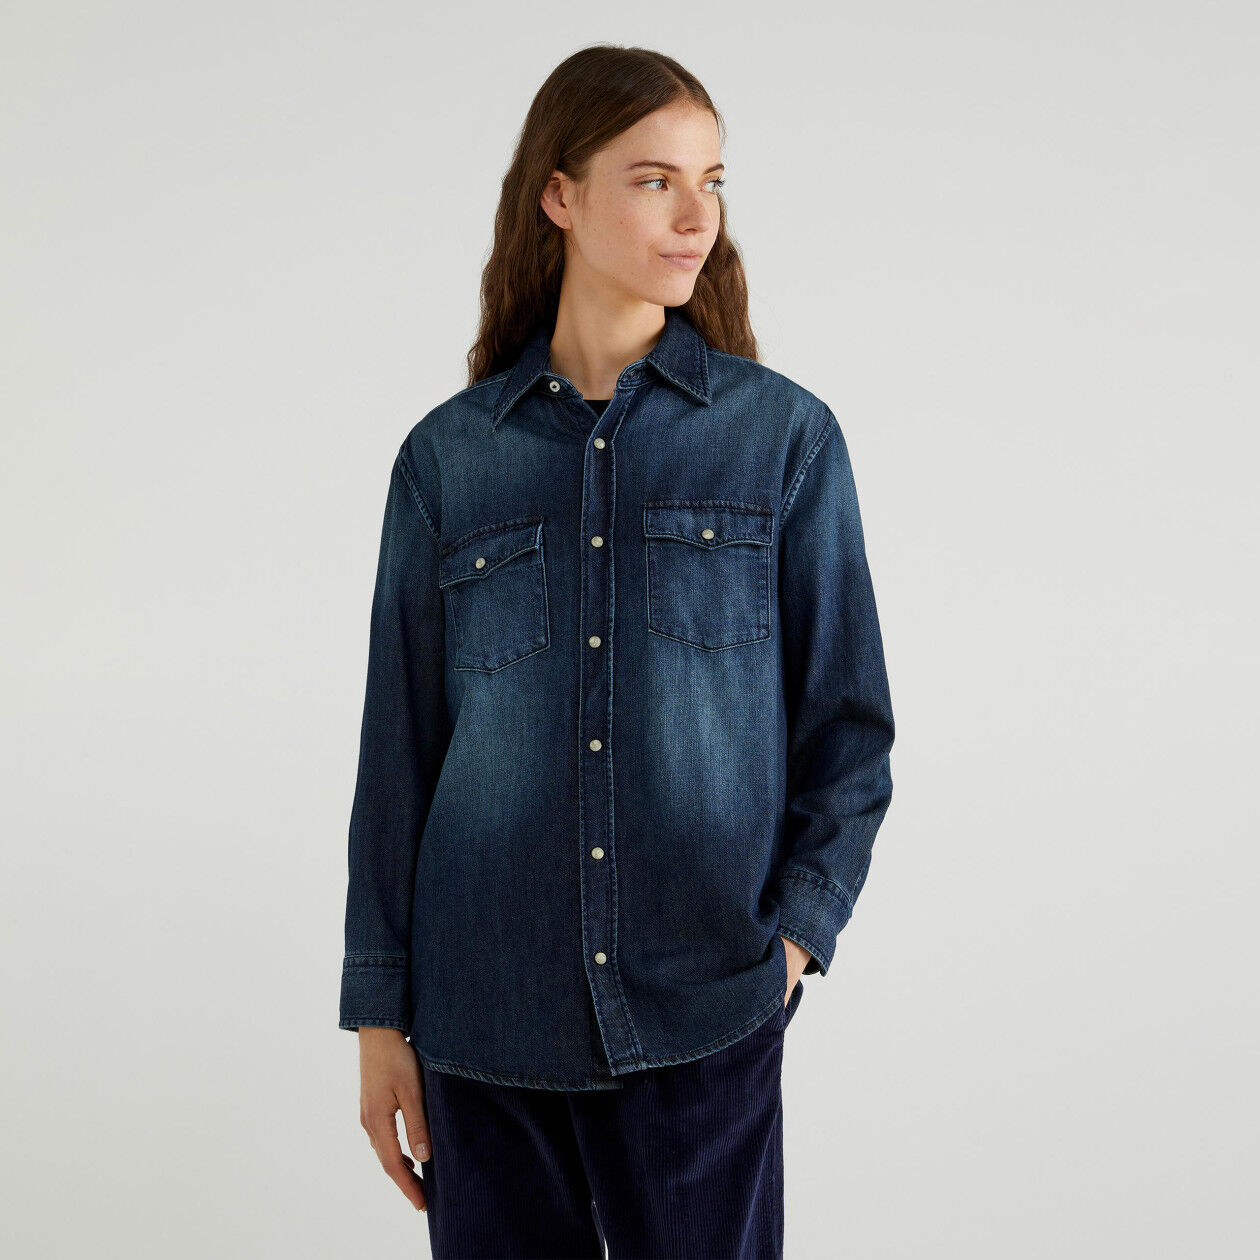 Vintage effect denim shirt